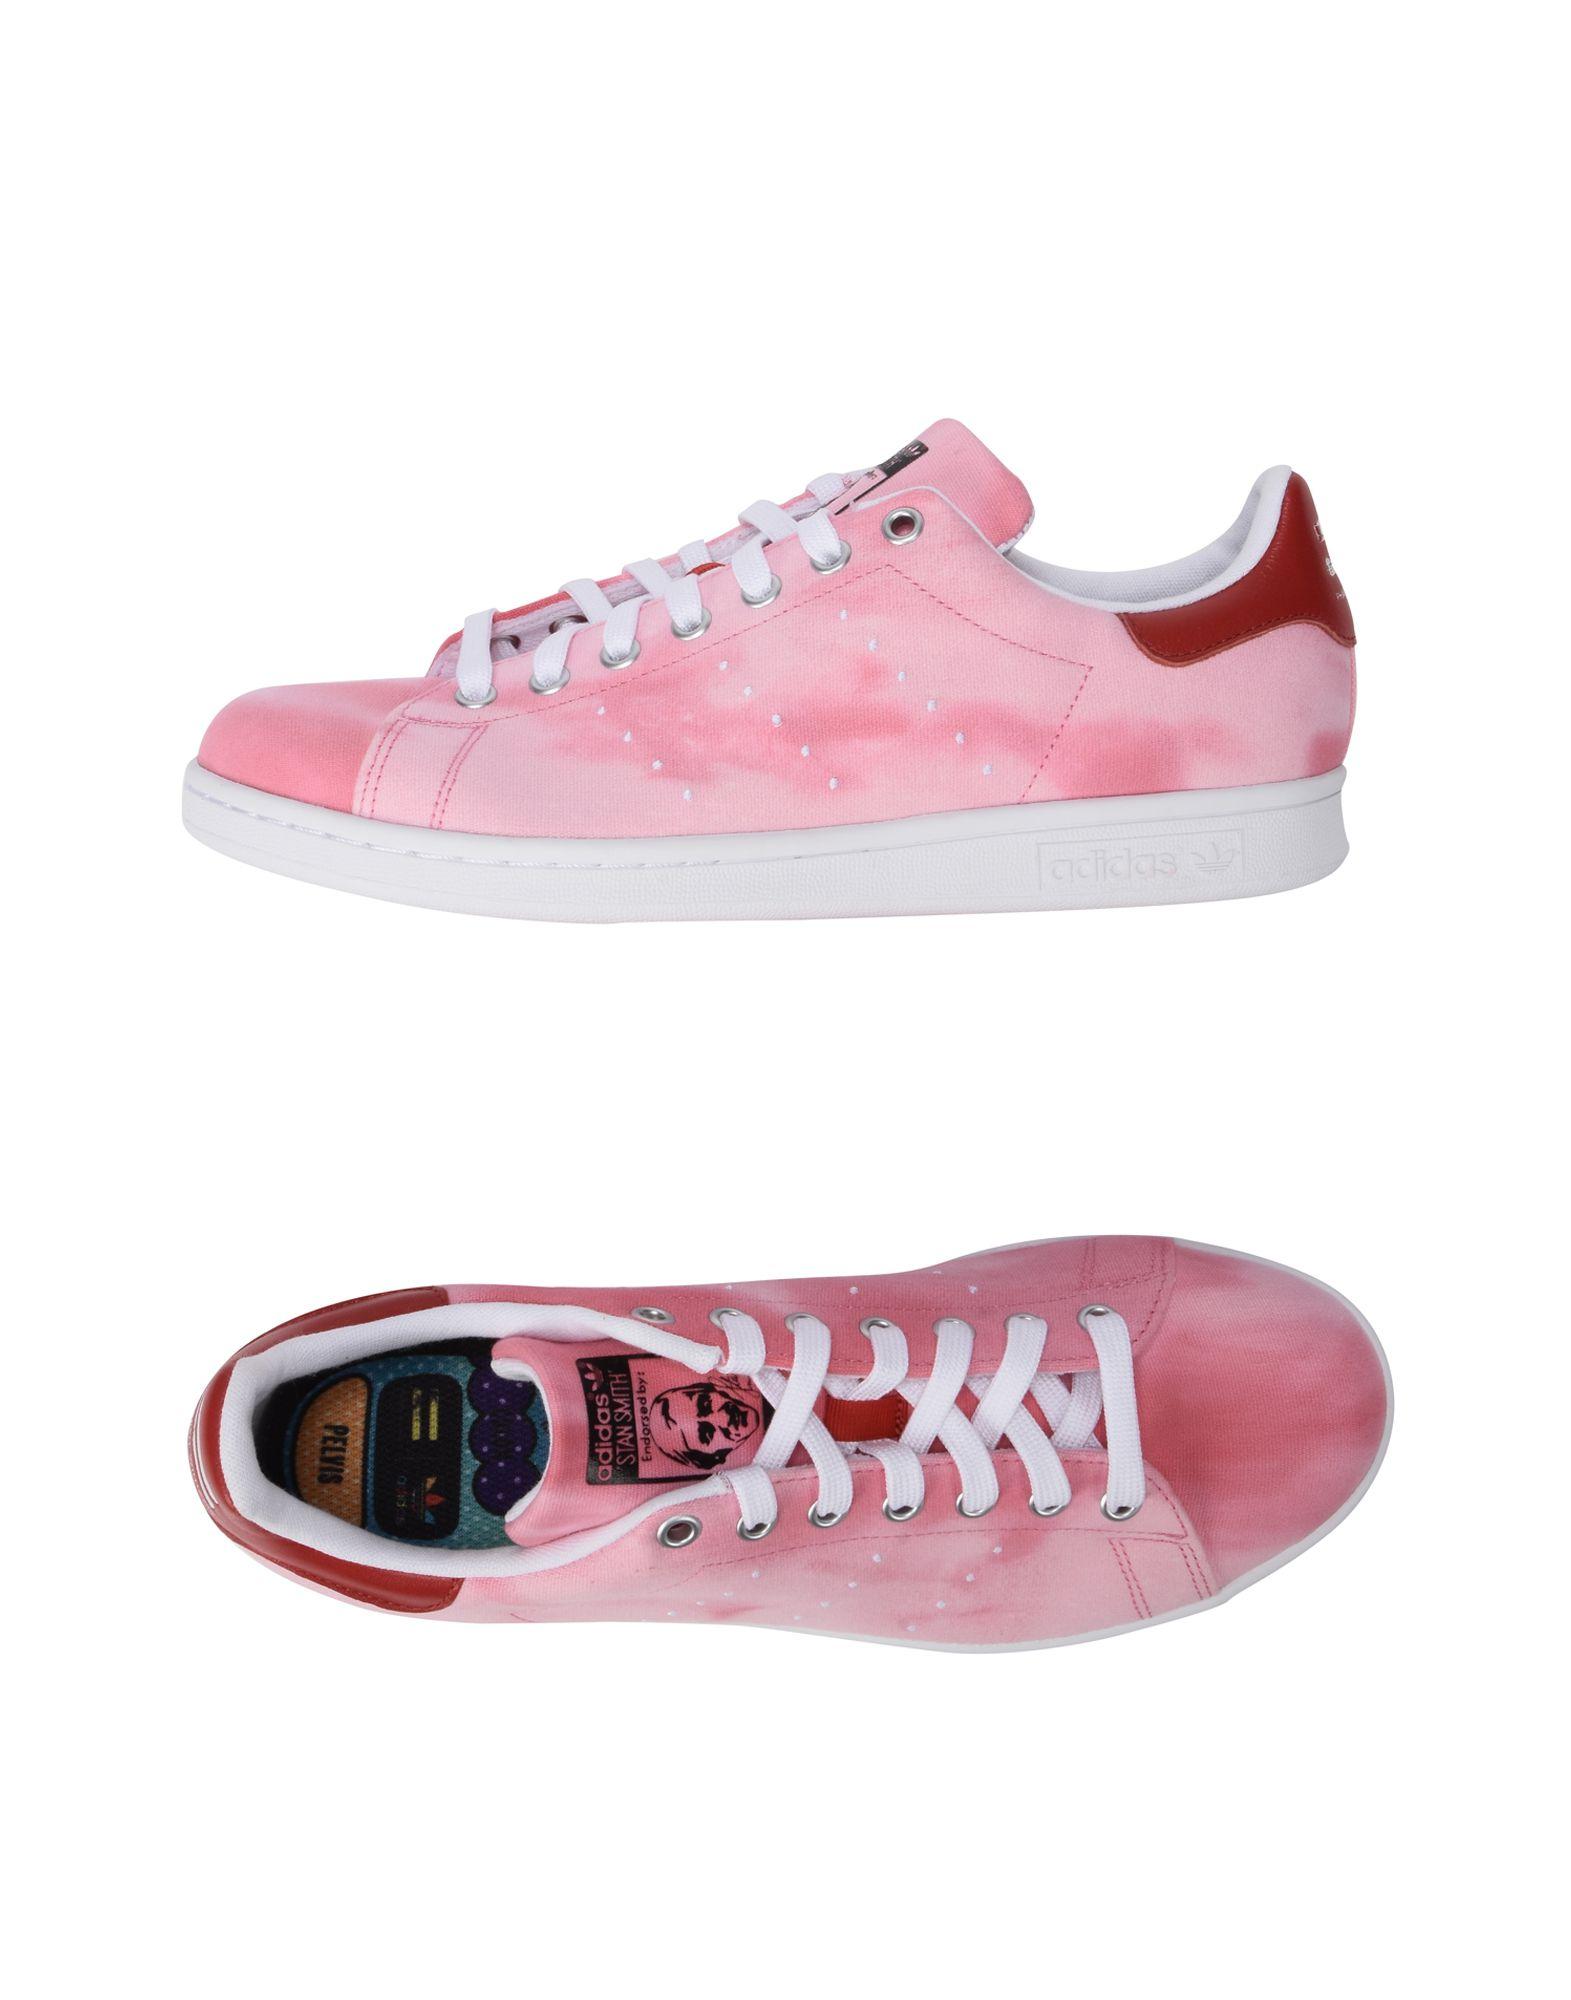 Adidas Originals By Pharrell Williams Pw Hu Holi Stan Smit - Uomo - 11458316CC